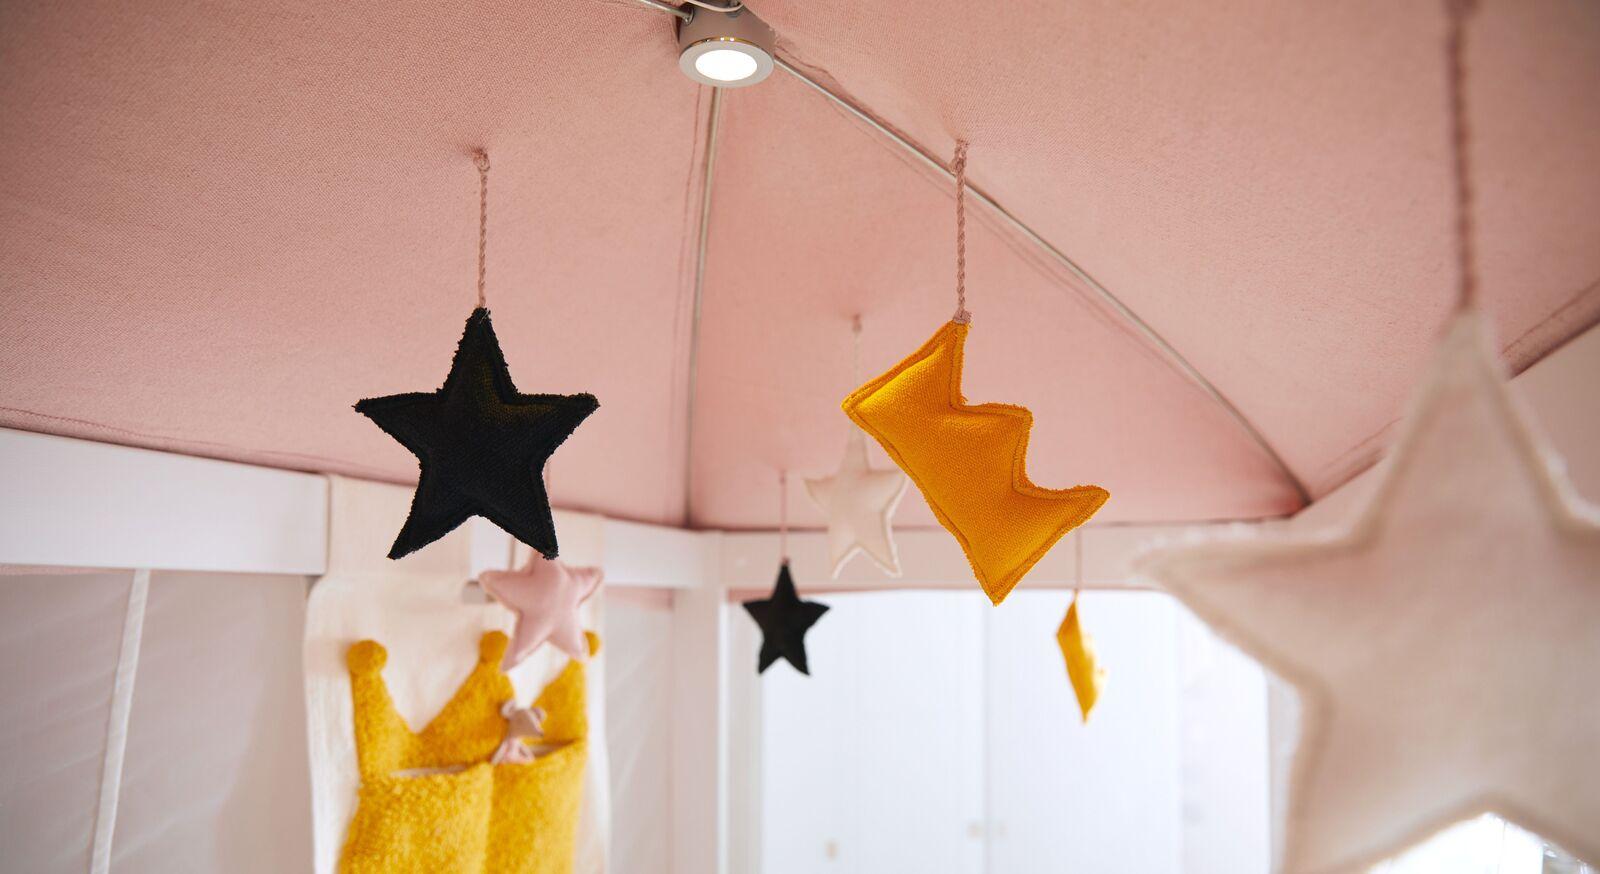 LIFETIME Kinderbett Princess Stars mit dekoriertem Dachhimmel